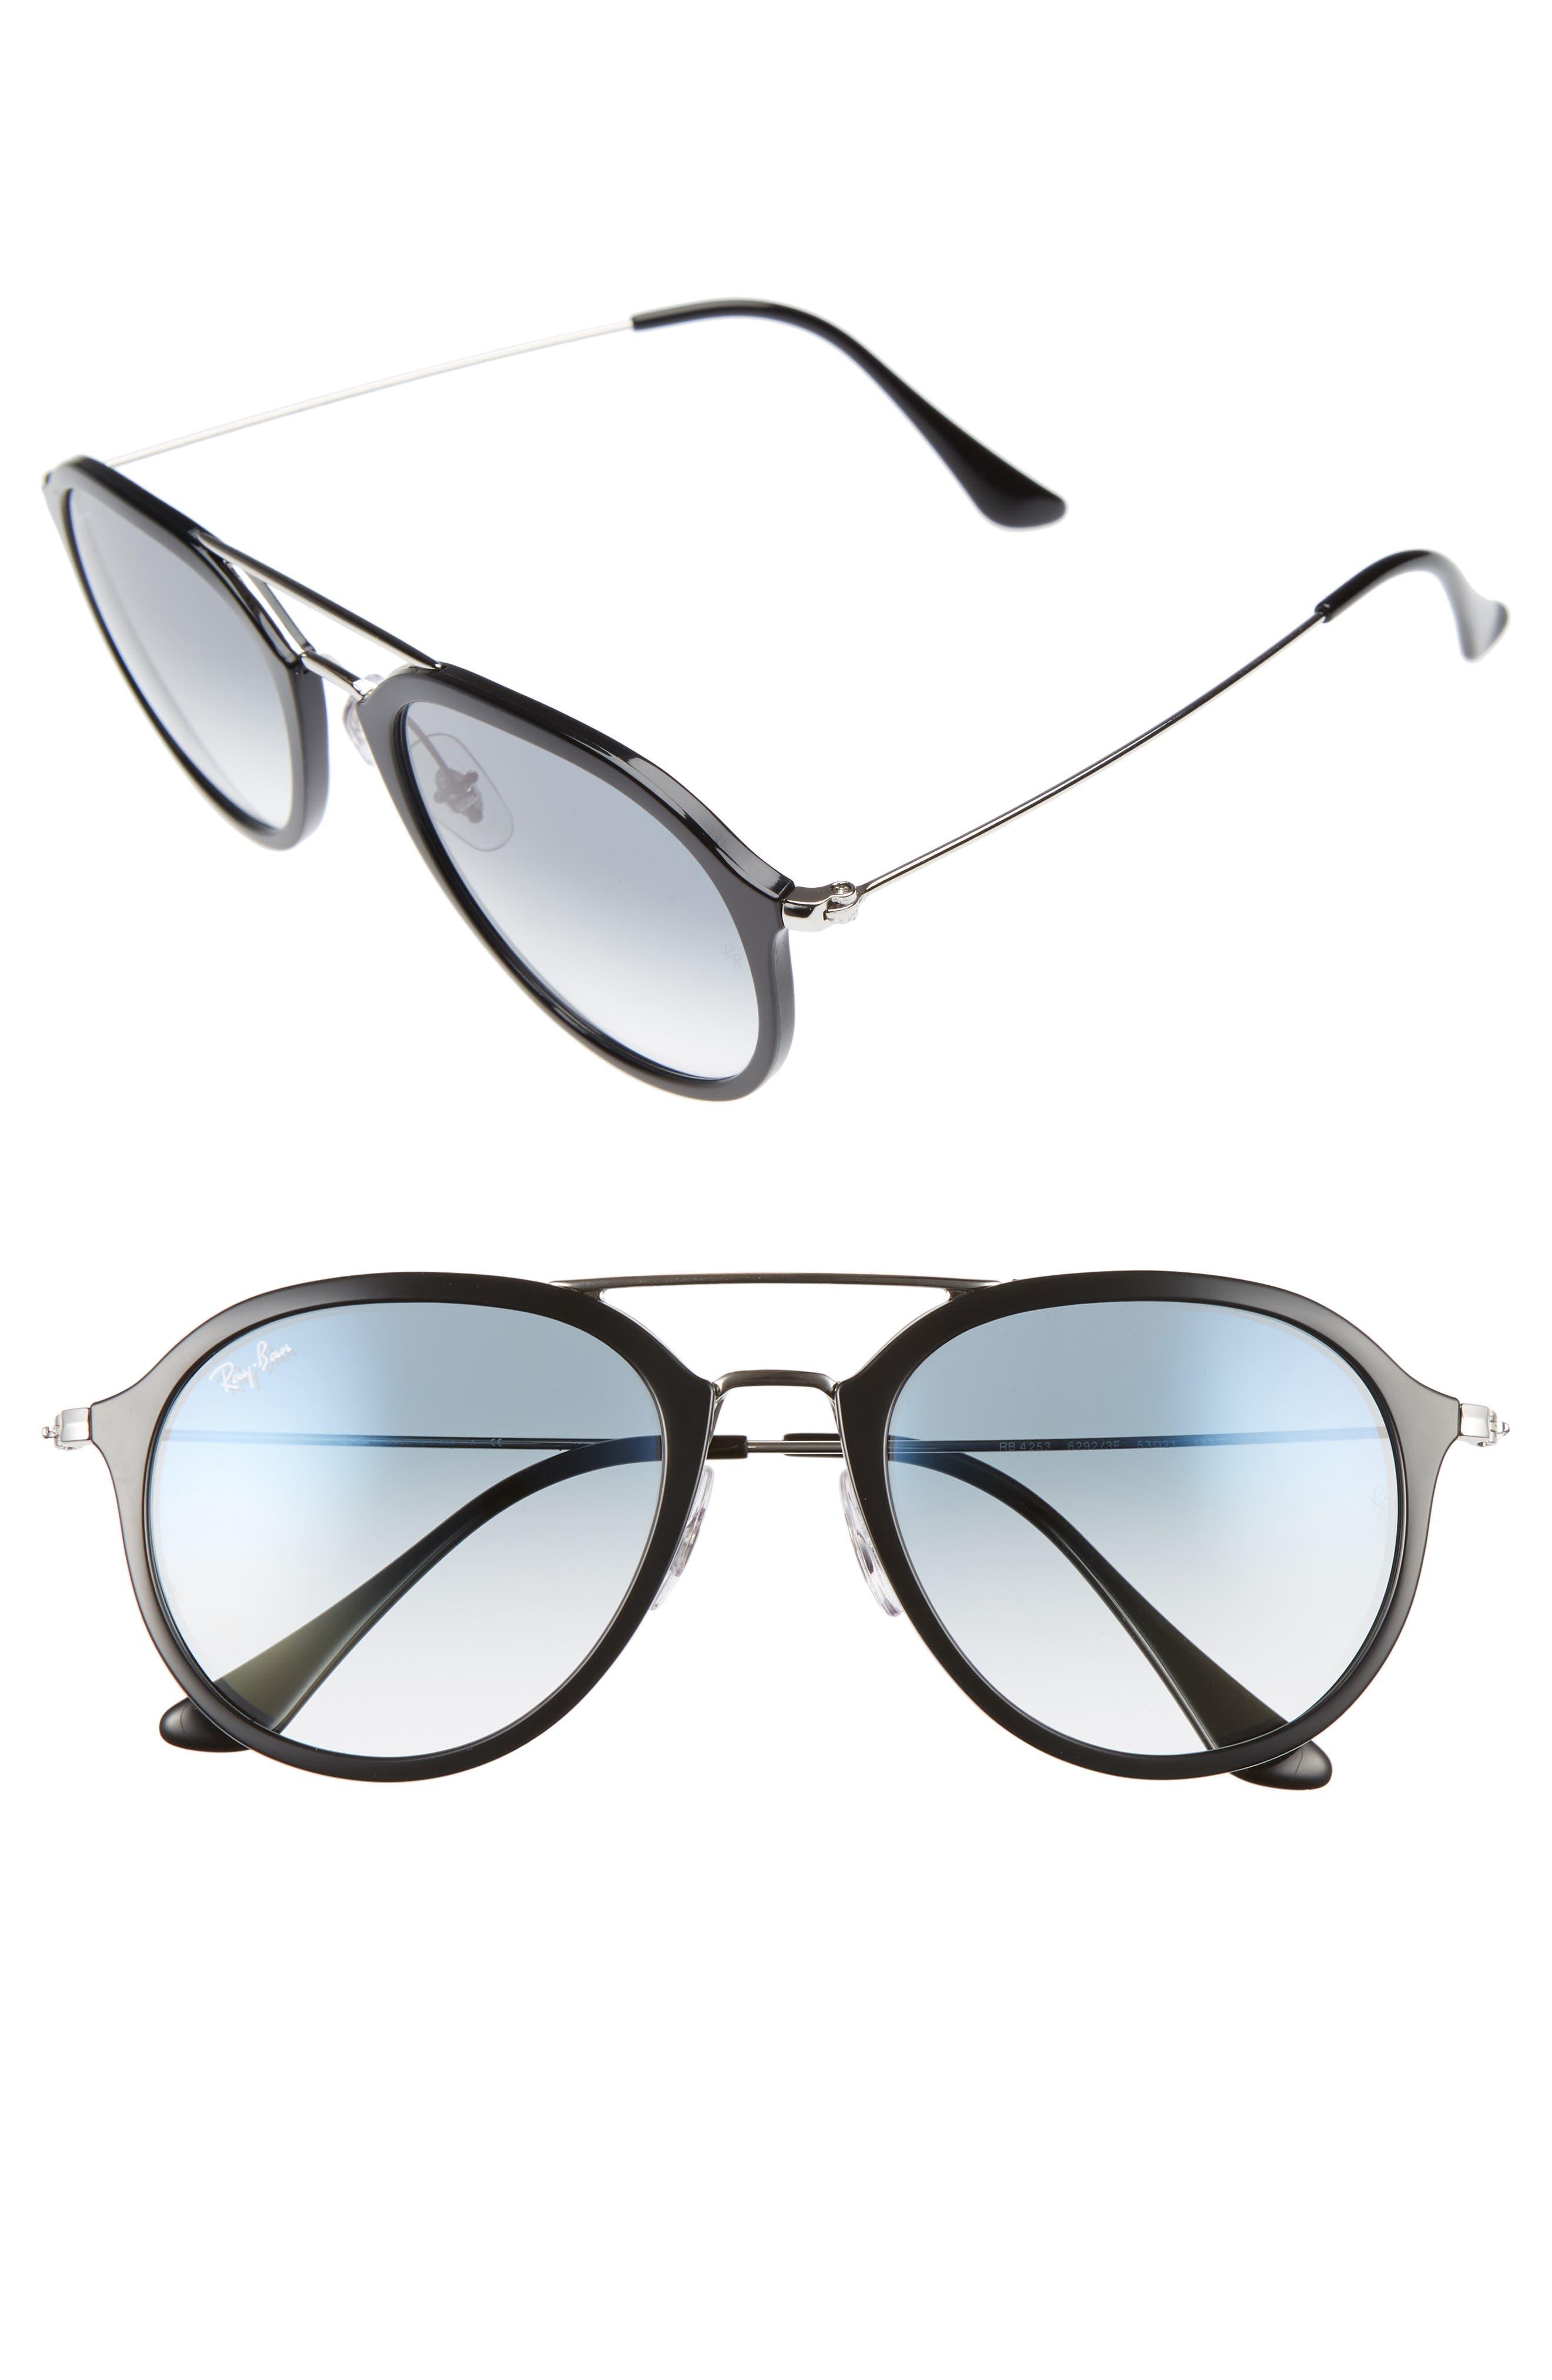 53mm Aviator Sunglasses,                             Main thumbnail 1, color,                             Black/ Silver